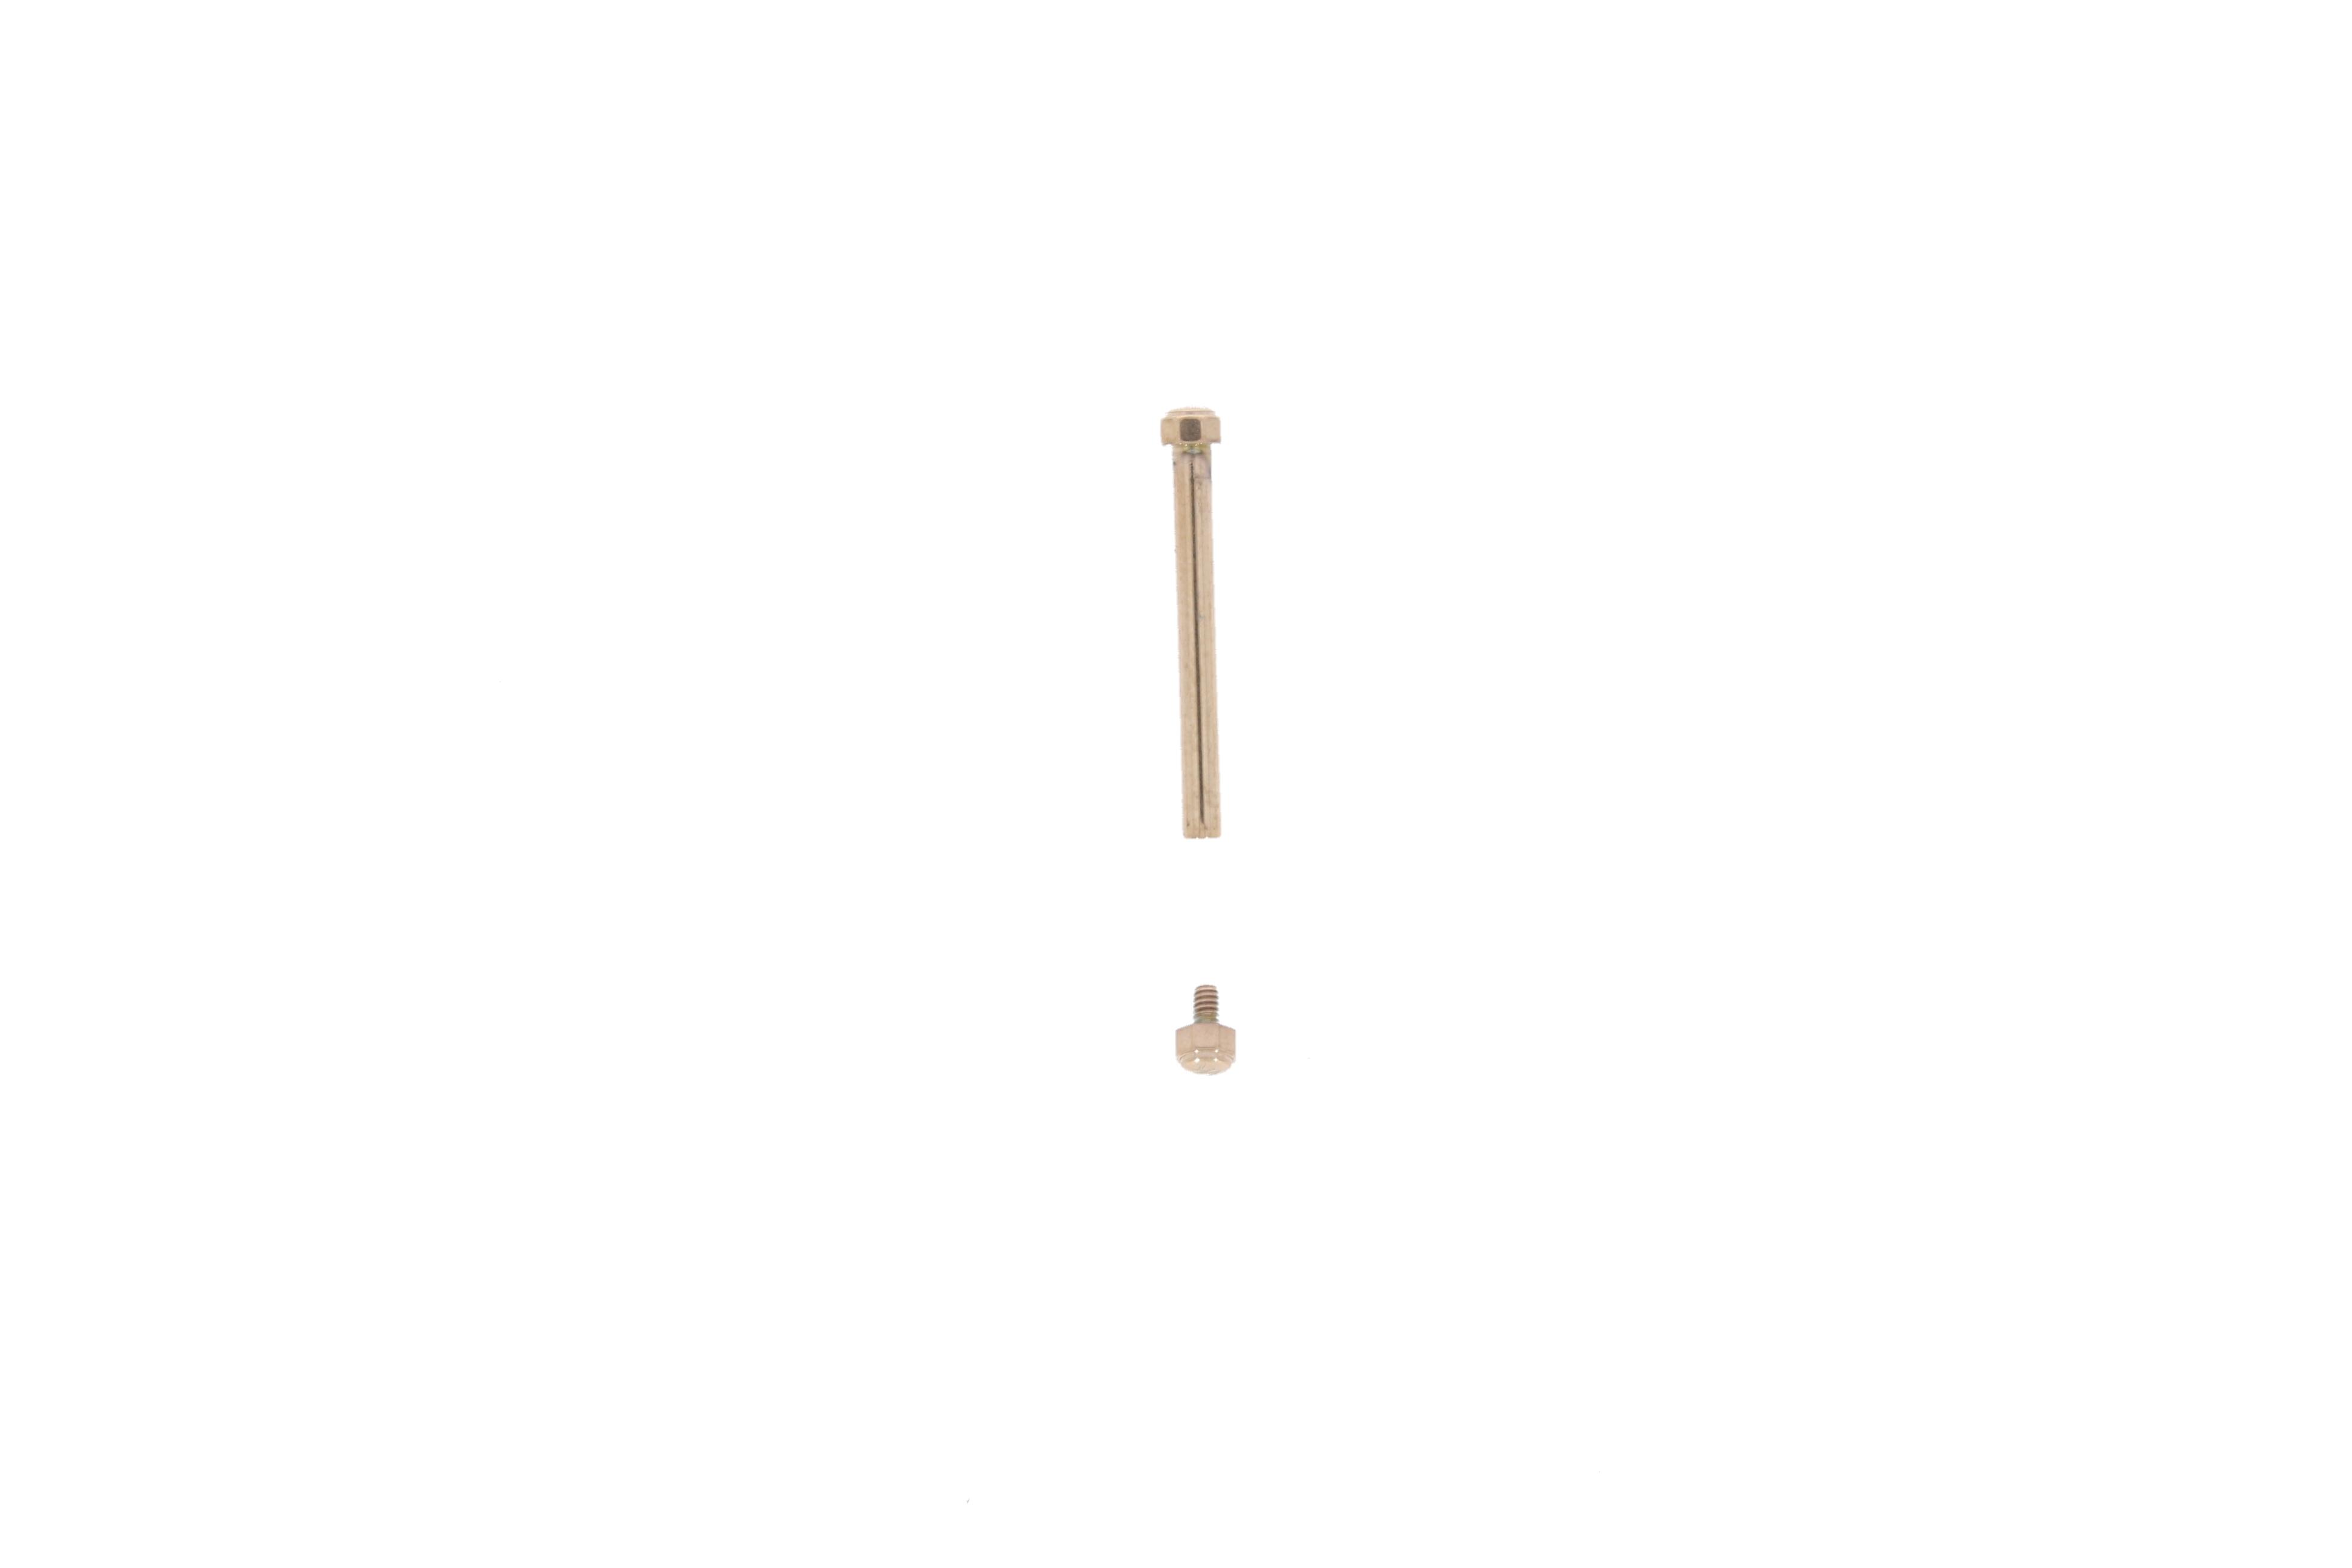 Michael Kors MK3192 Horlogeband/-kast Schroefpen (1 stuk)